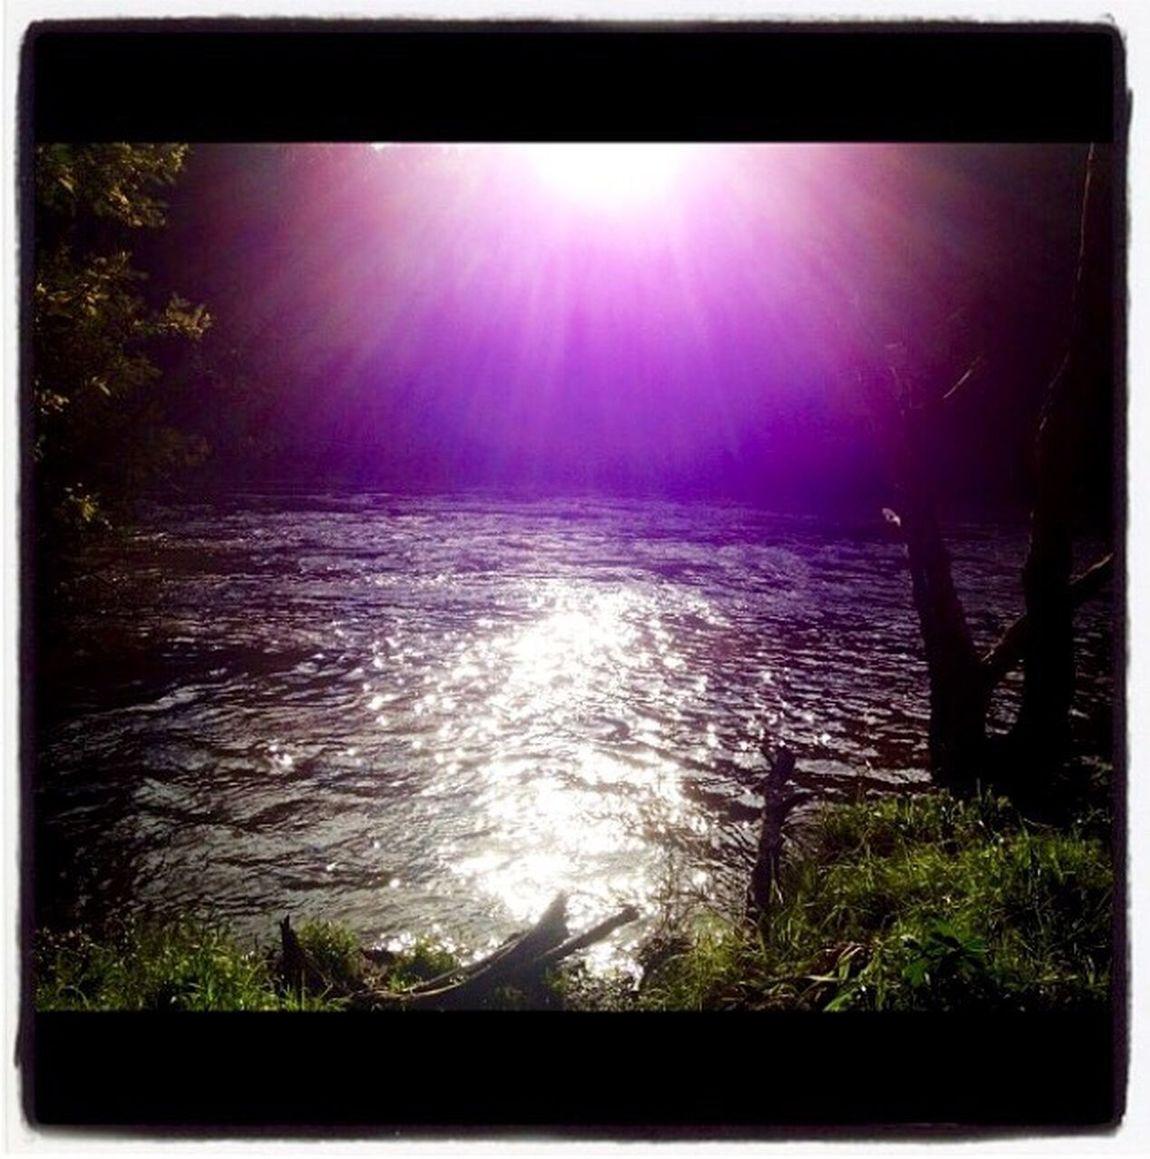 The Lake of Warrandyte. 💜💜💜 Warrandyte Magical Lake Fantasy Sunshining Reflection Sparkling Thelakeofwarrandyte Pretty Purple Water 💜💜💜